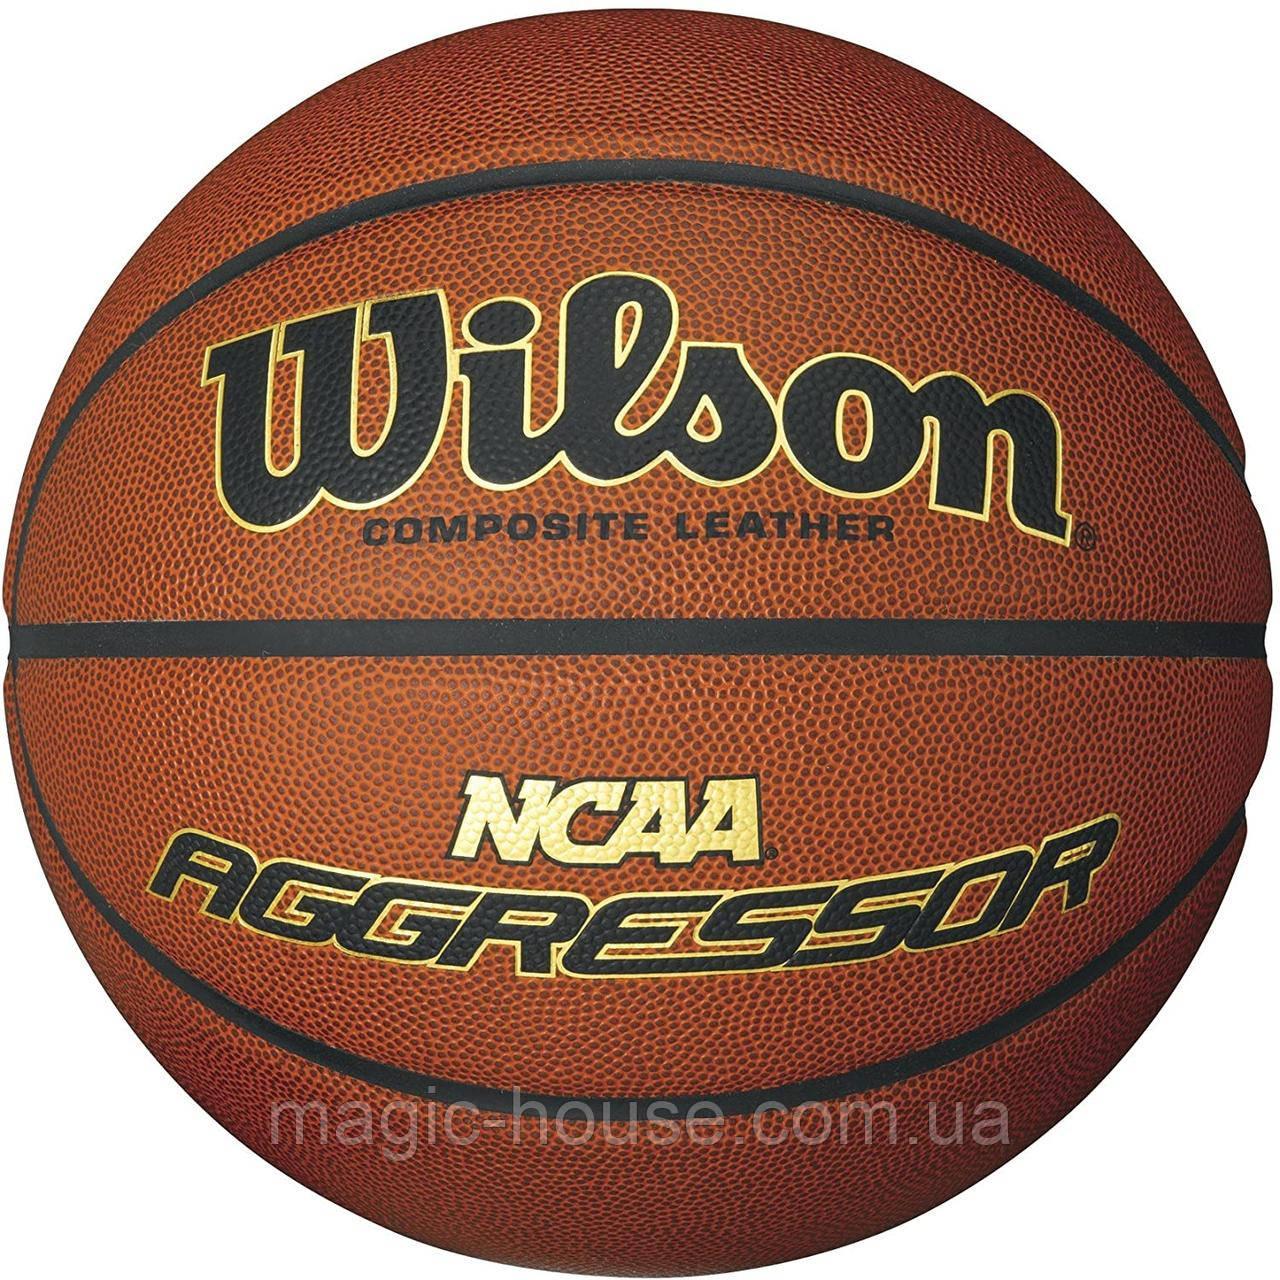 Wilson NCAA Aggressor Composite Leather Ball М'яч баскетбольний вілсон оригінал розмір 7 композитна шкіра